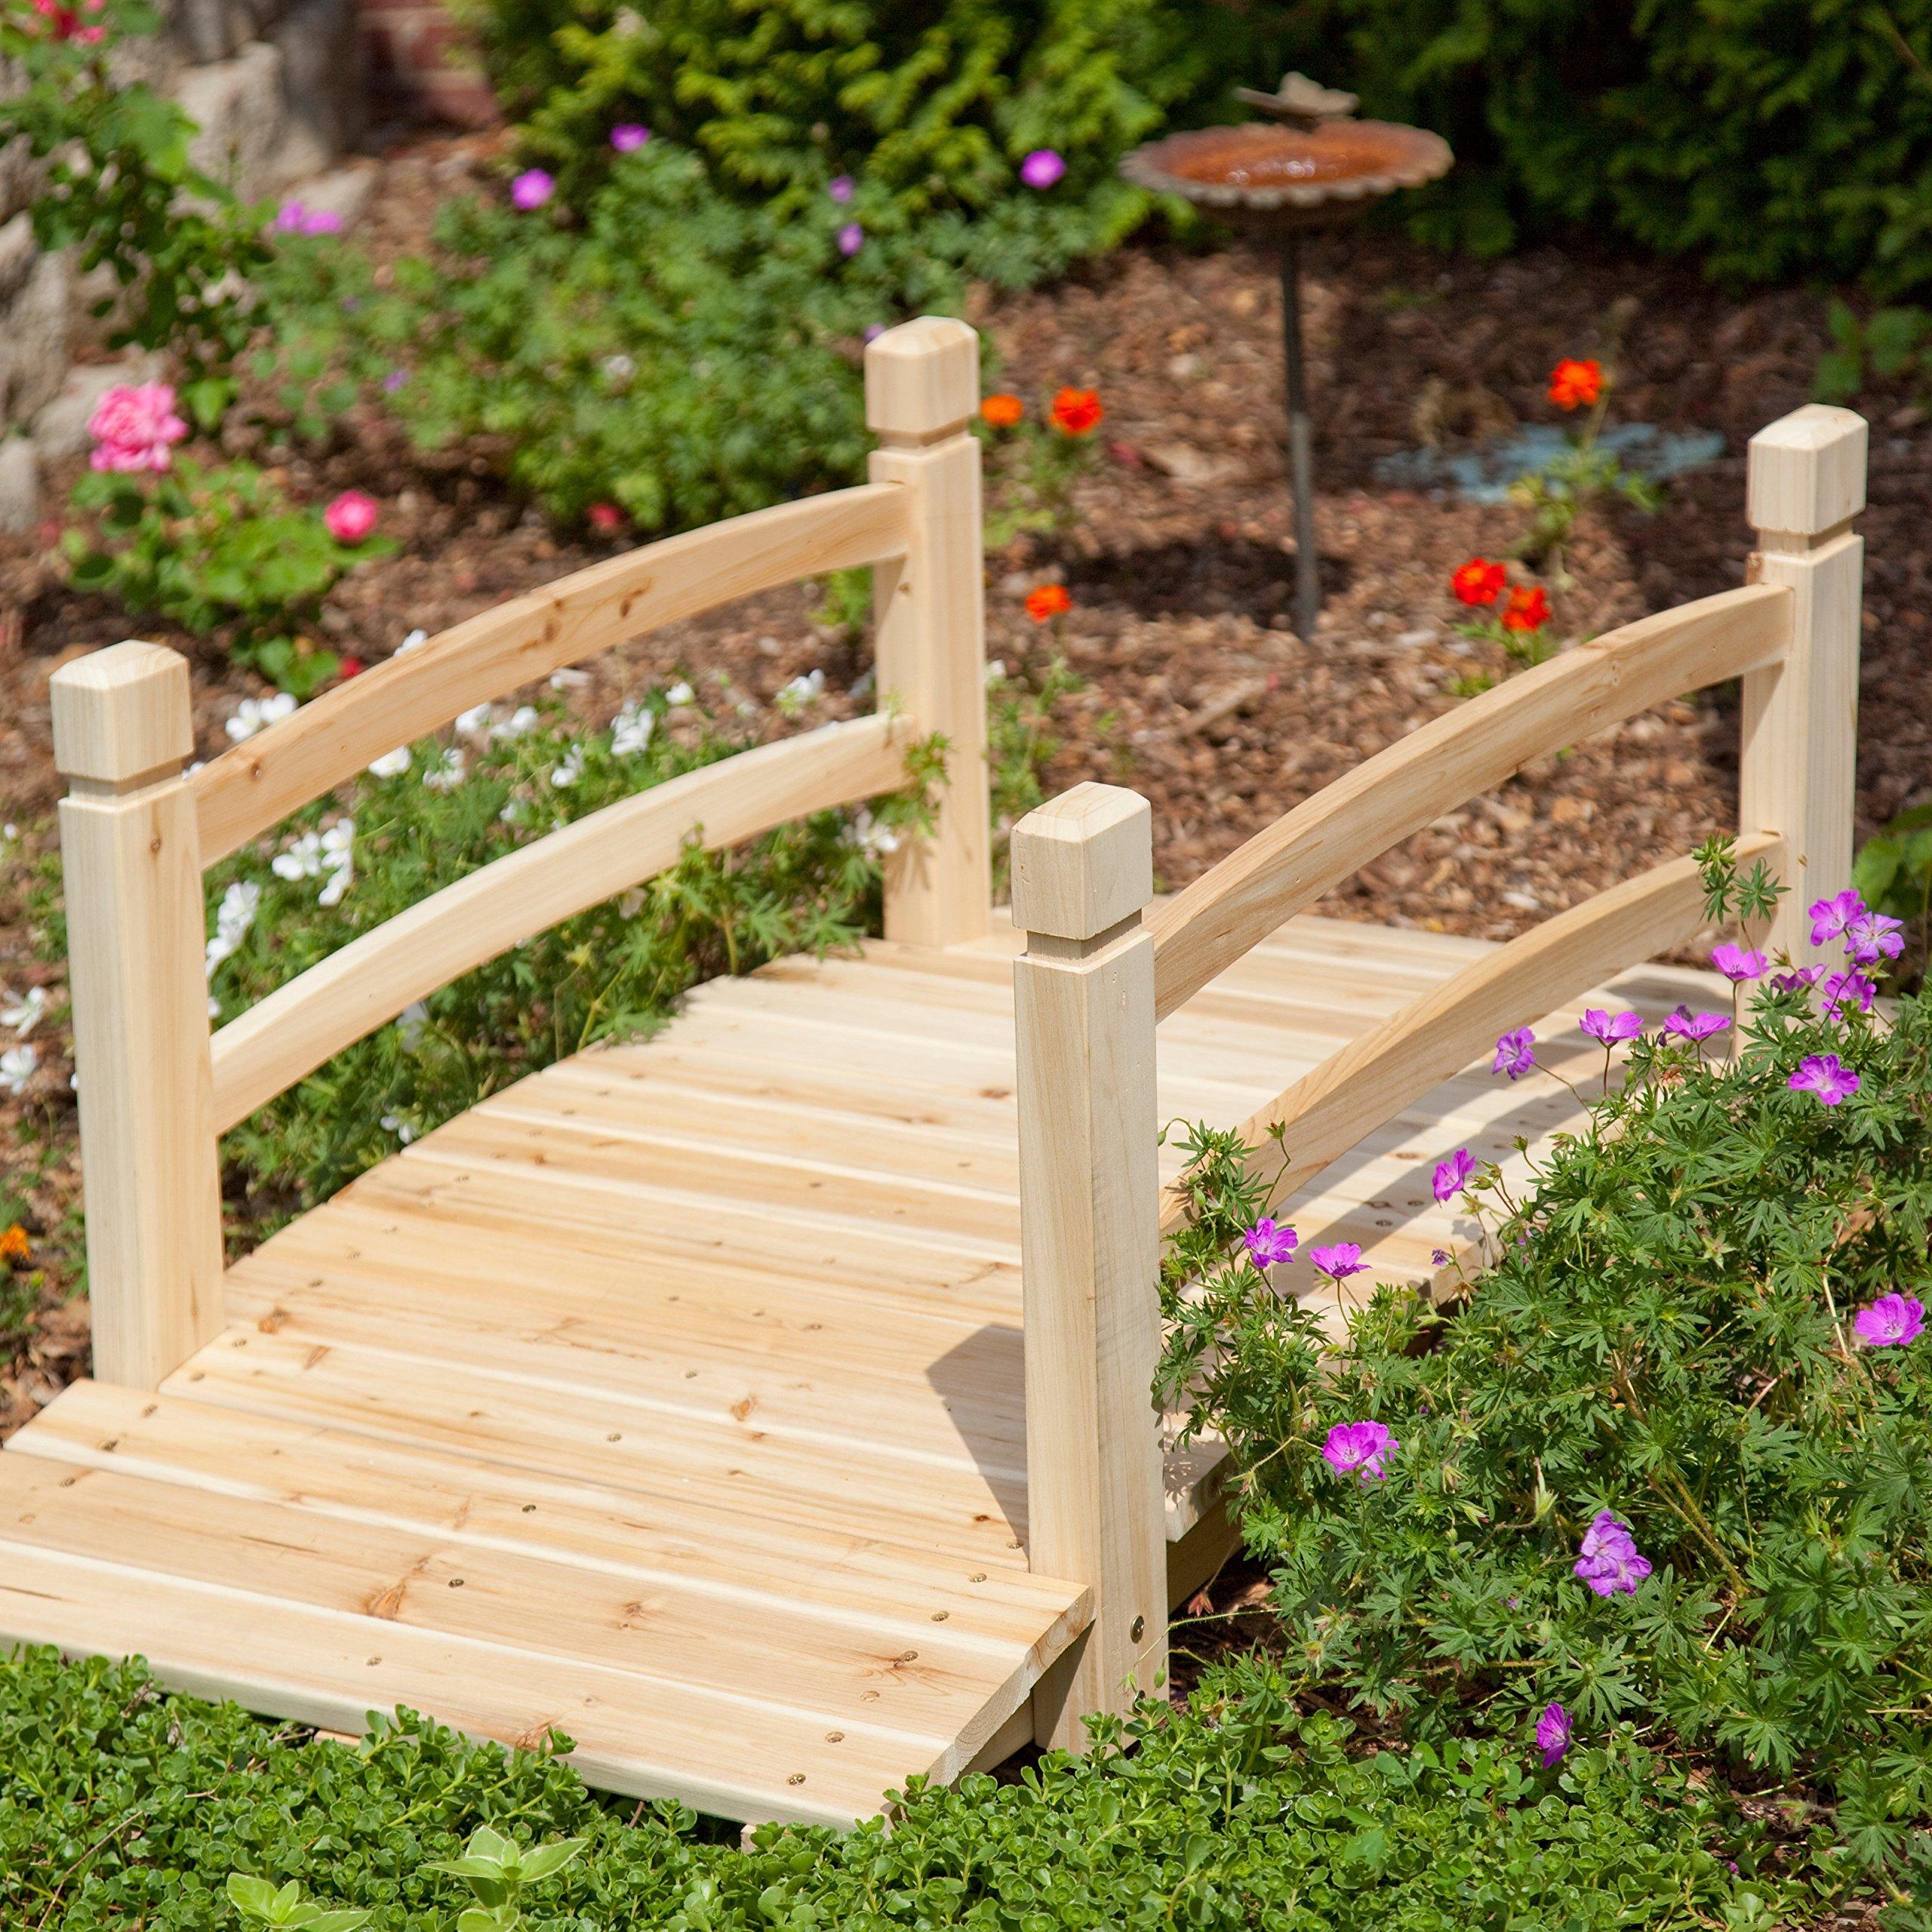 Natural Wood Finish 48'' Garden Bridge Outdoor Yard Lawn Landscaping Decor